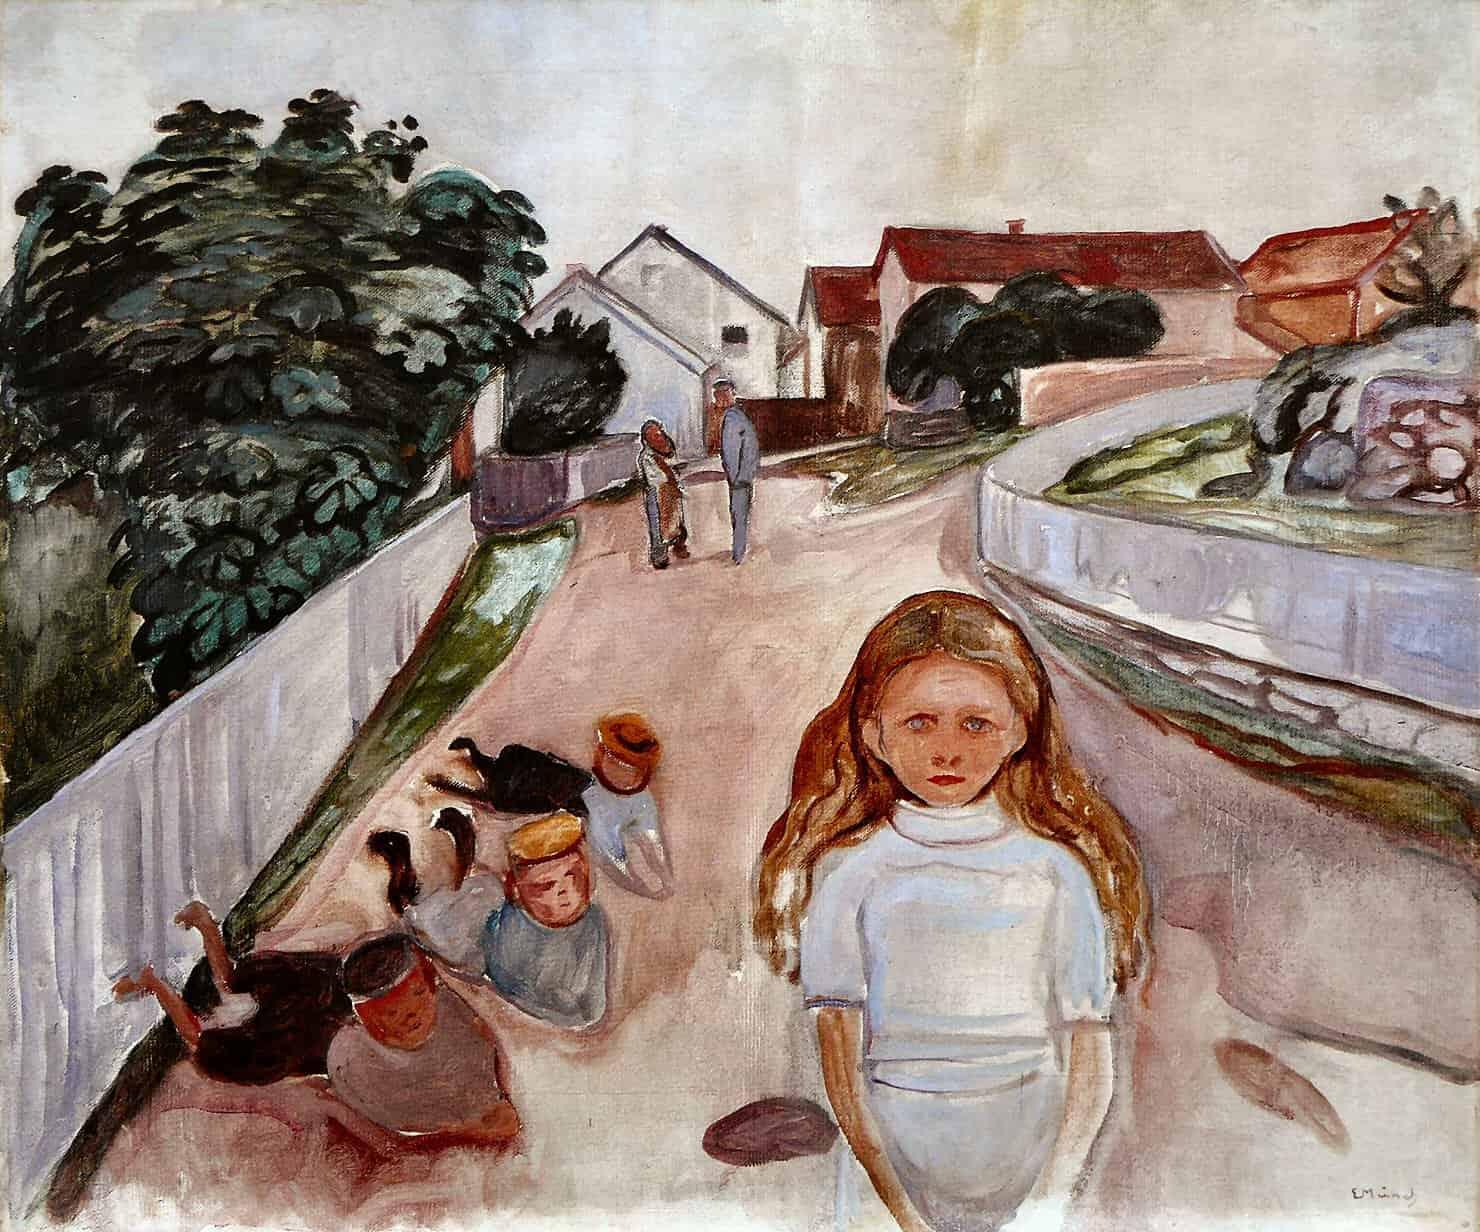 Edvard Munch - Street in Åsgårdstrand (1902)